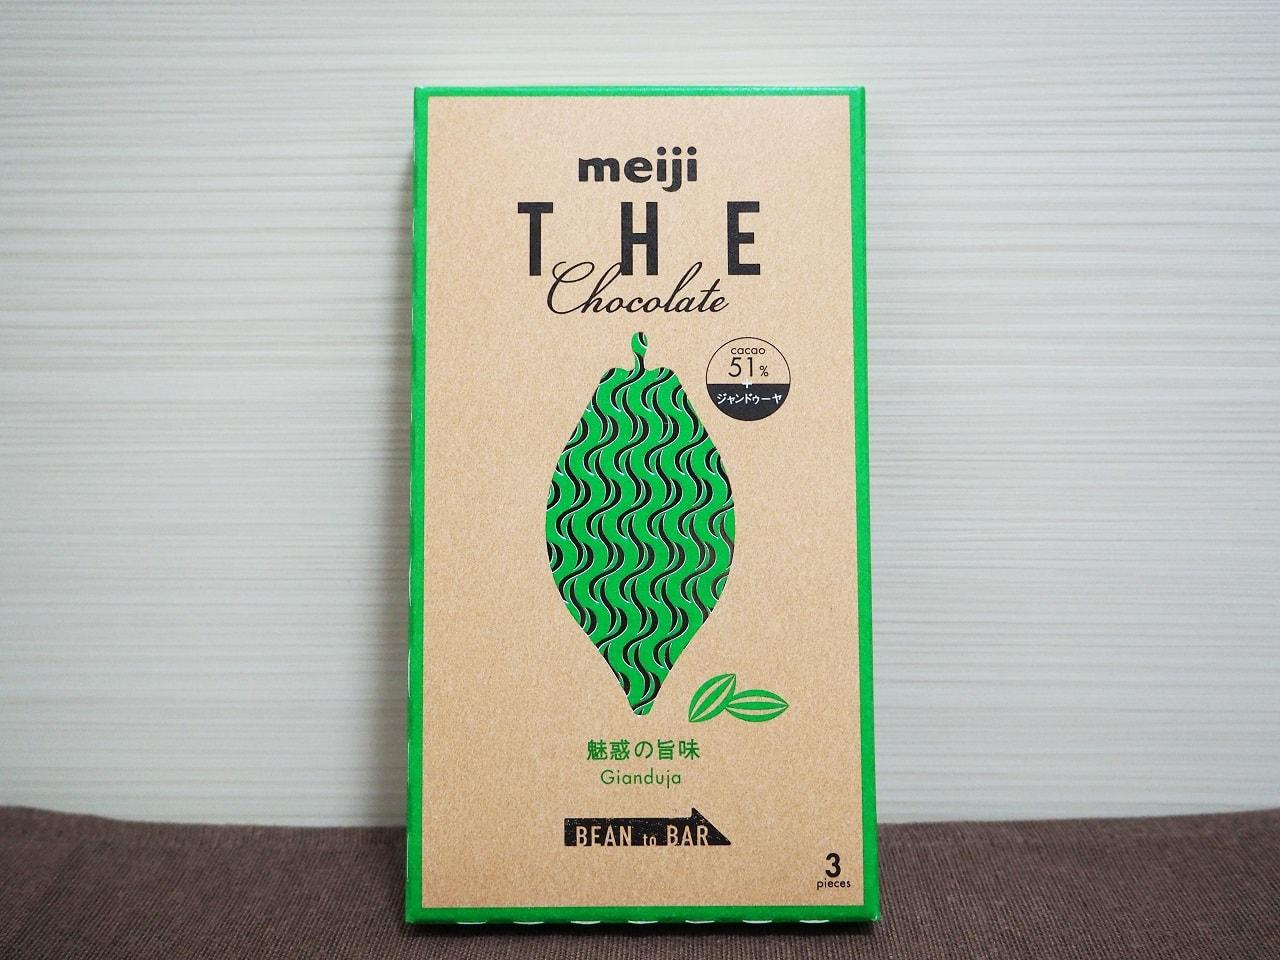 meiji-the-chocolate-21